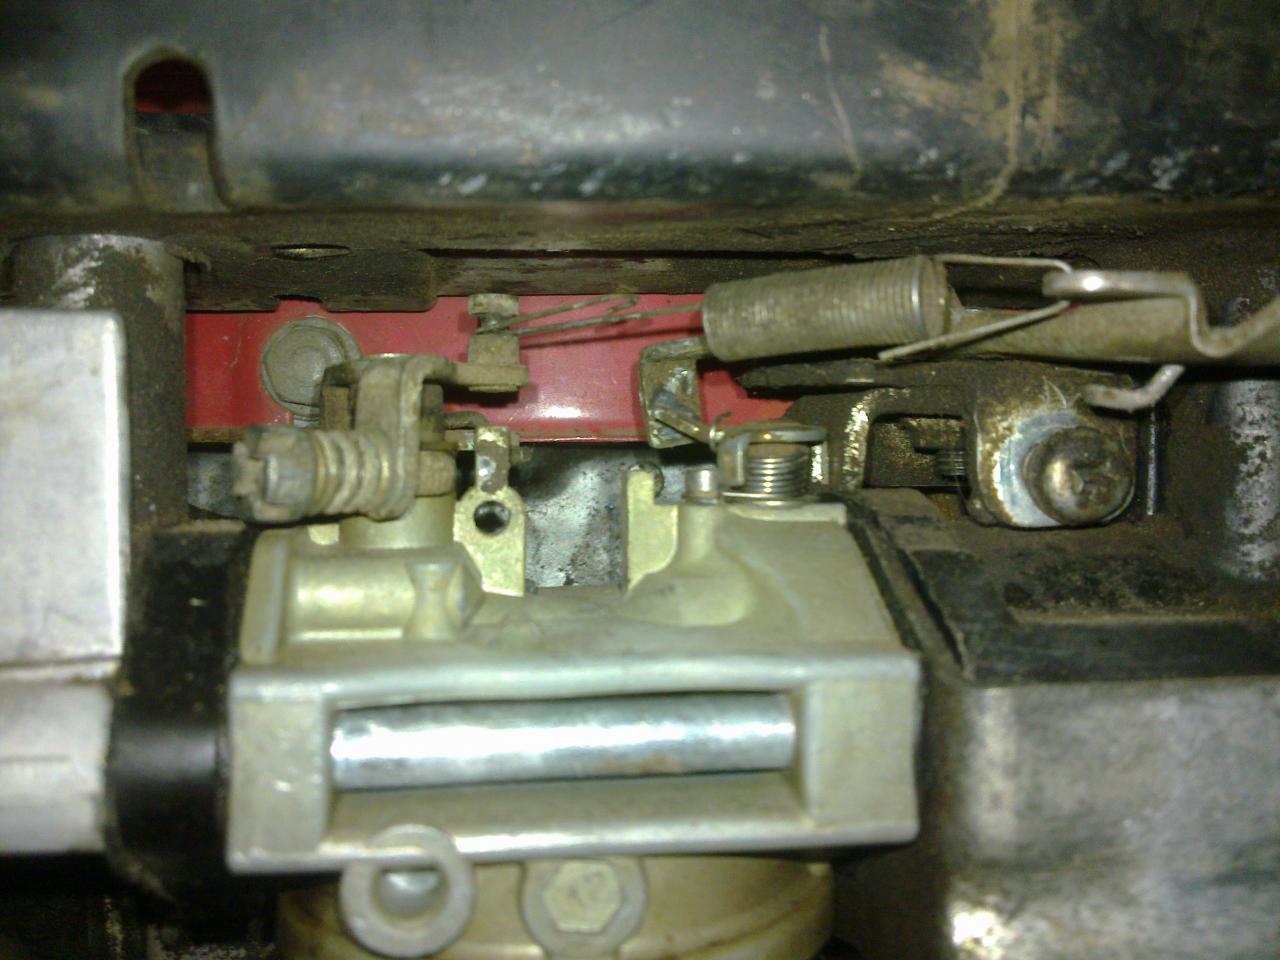 Diagram Of Honda Lawn Mower Parts Hr21 Sxa Lawn Mower Jpn Vin Hr21